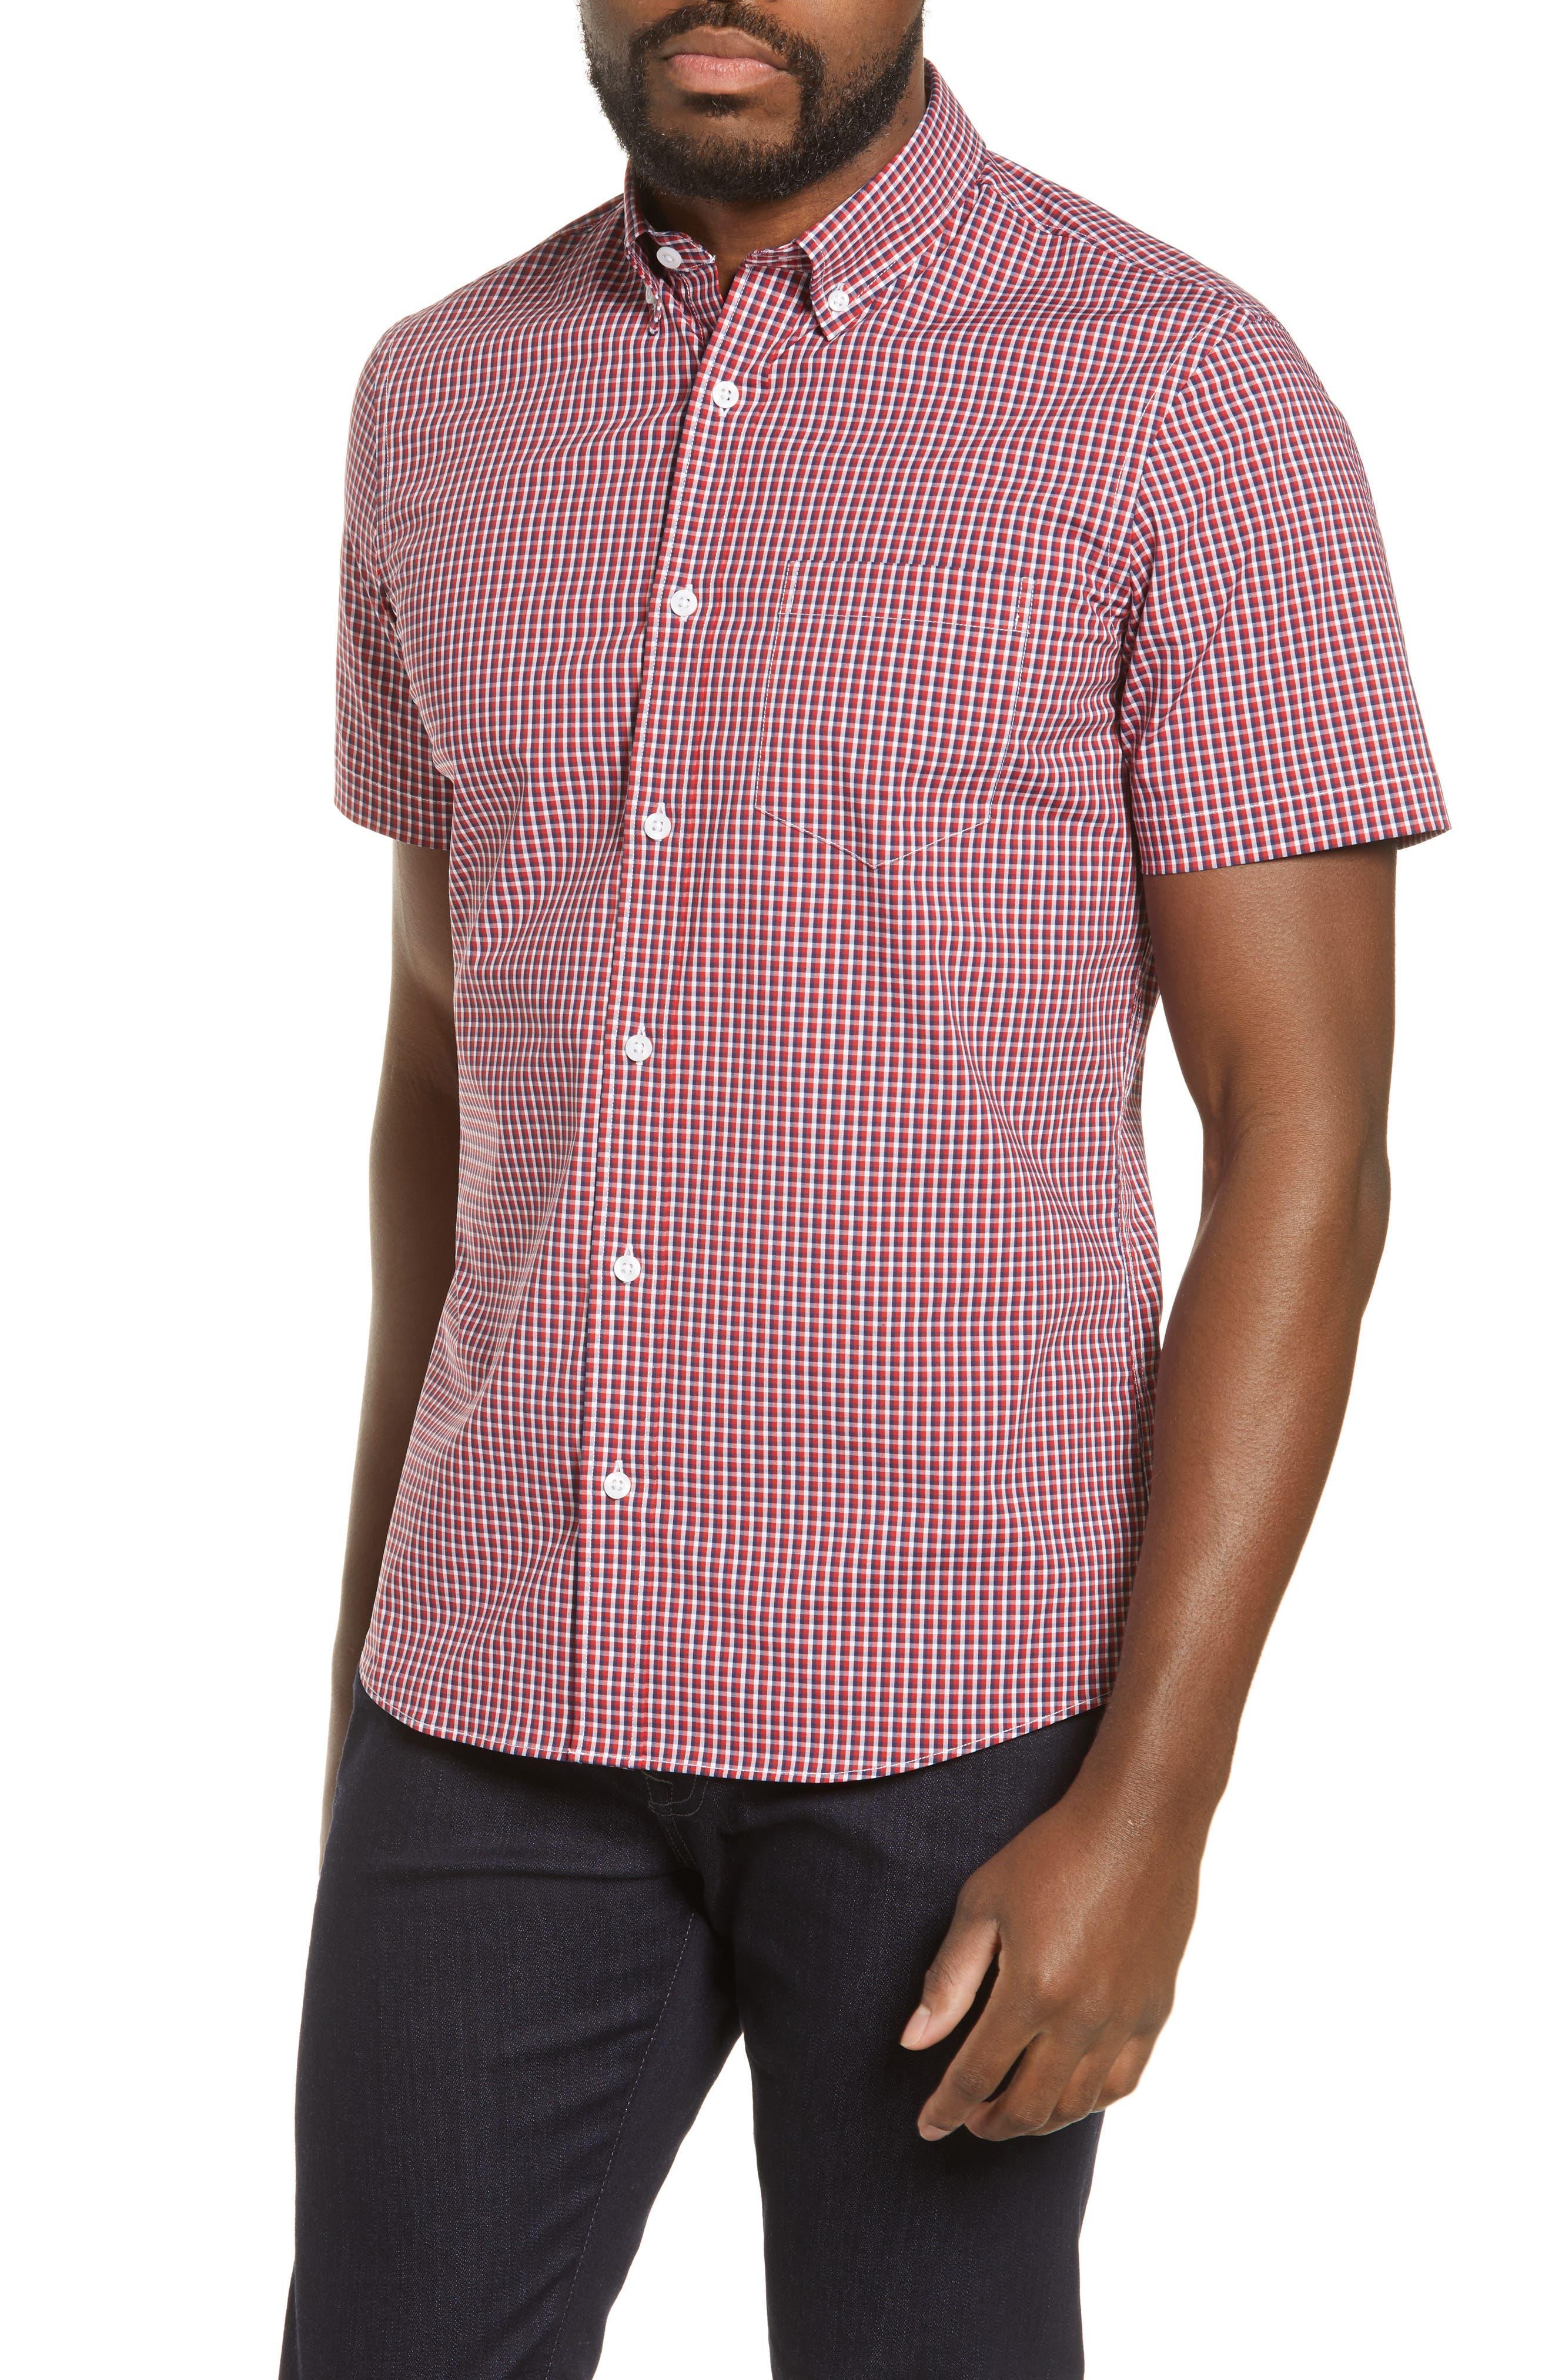 Tech-Smart Regular Fit Check Sport Shirt, Main, color, RED POMPEII NAVY CHECK